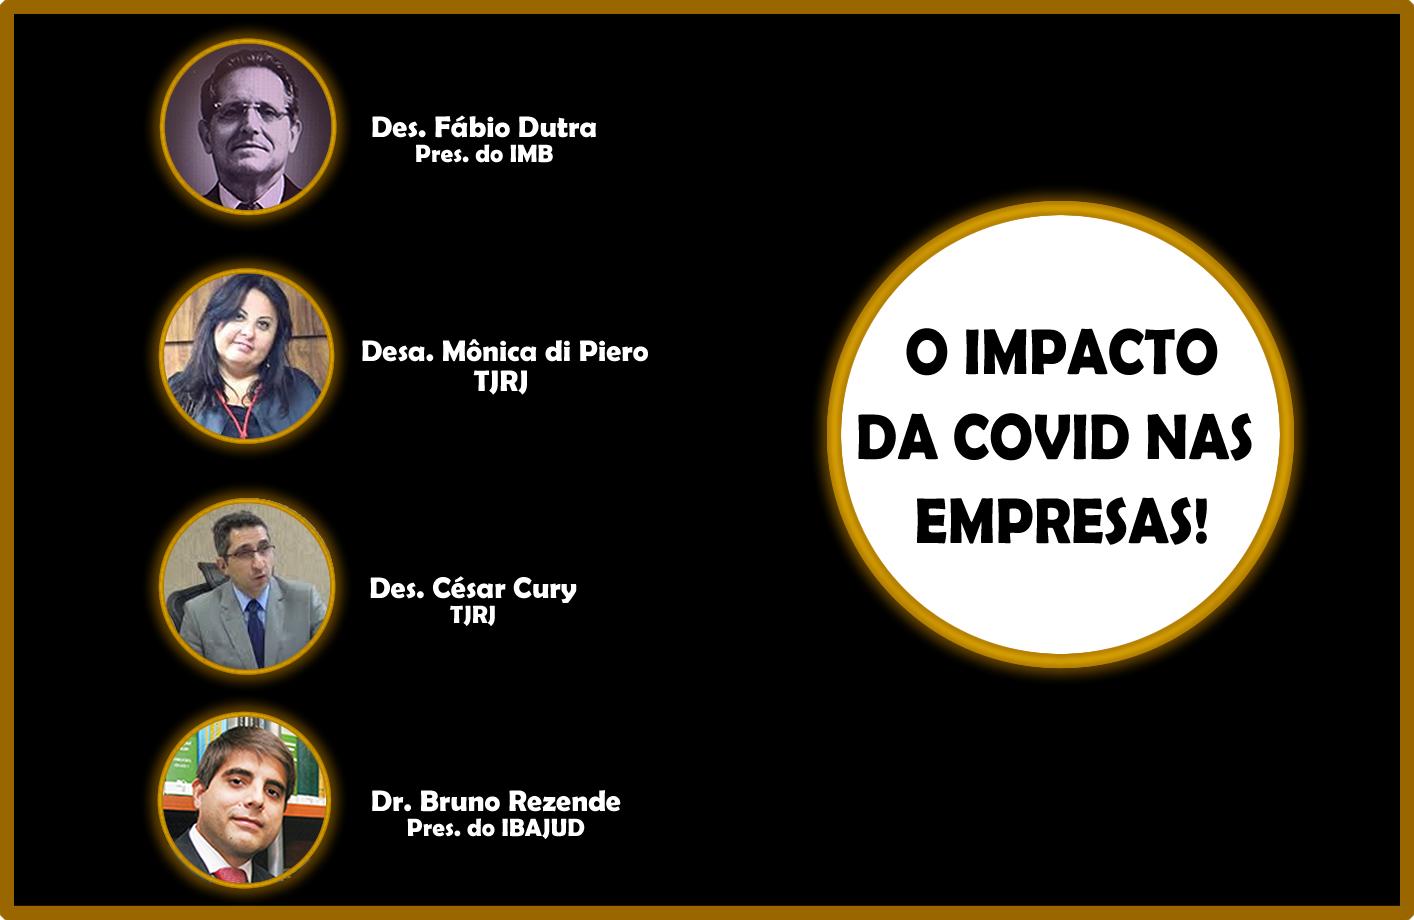 O Impacto da Covid nas Empresas!